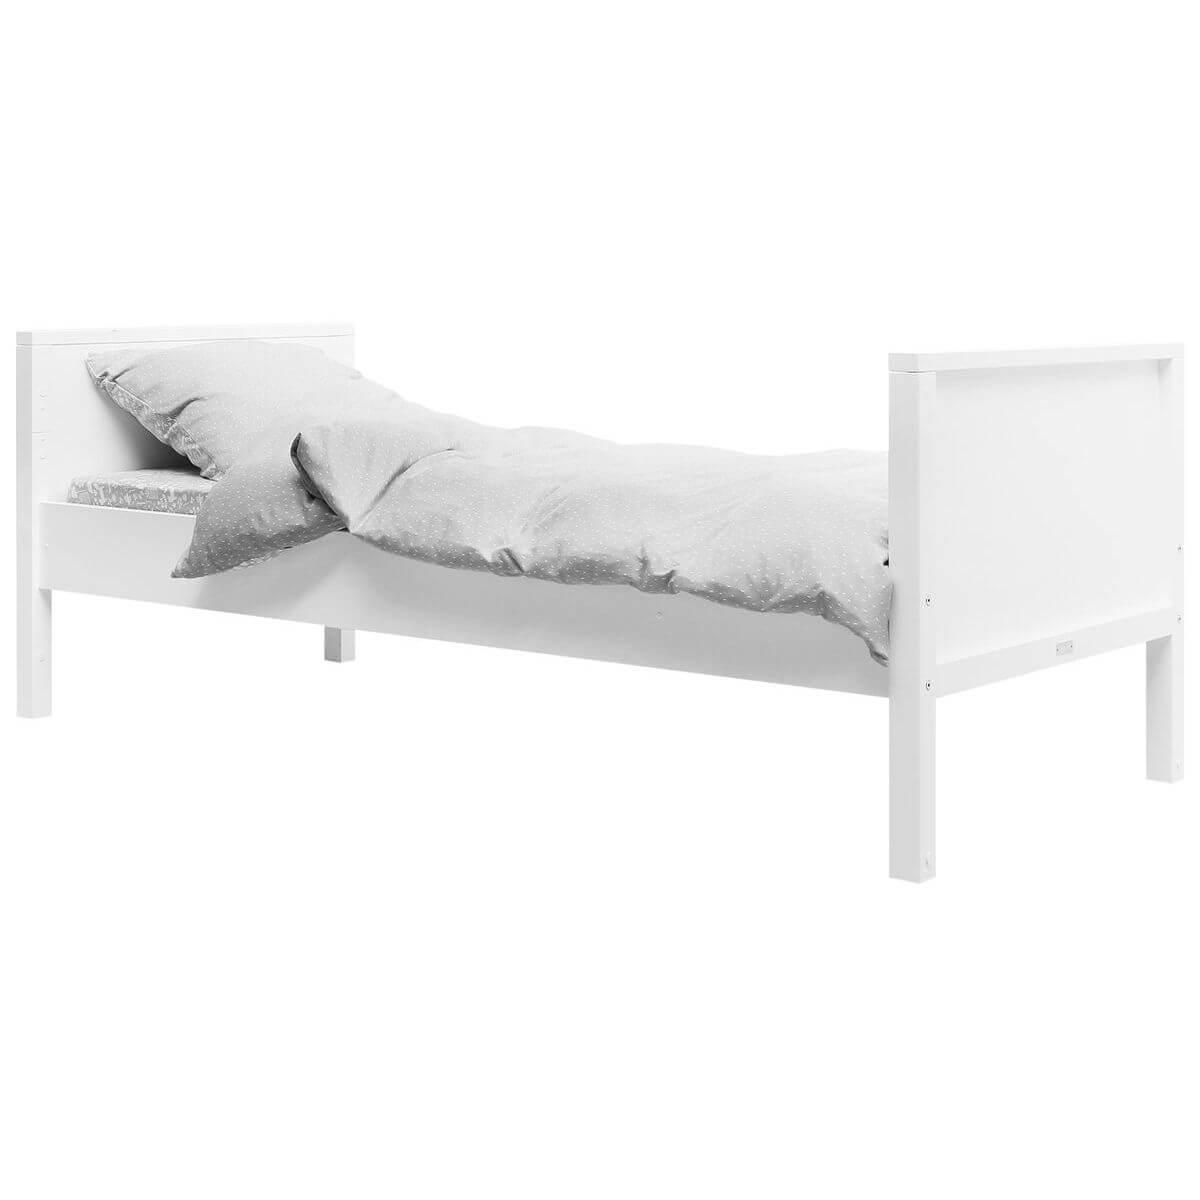 Cama evolutiva básica 90x200cm NORDIC Bopita blanco